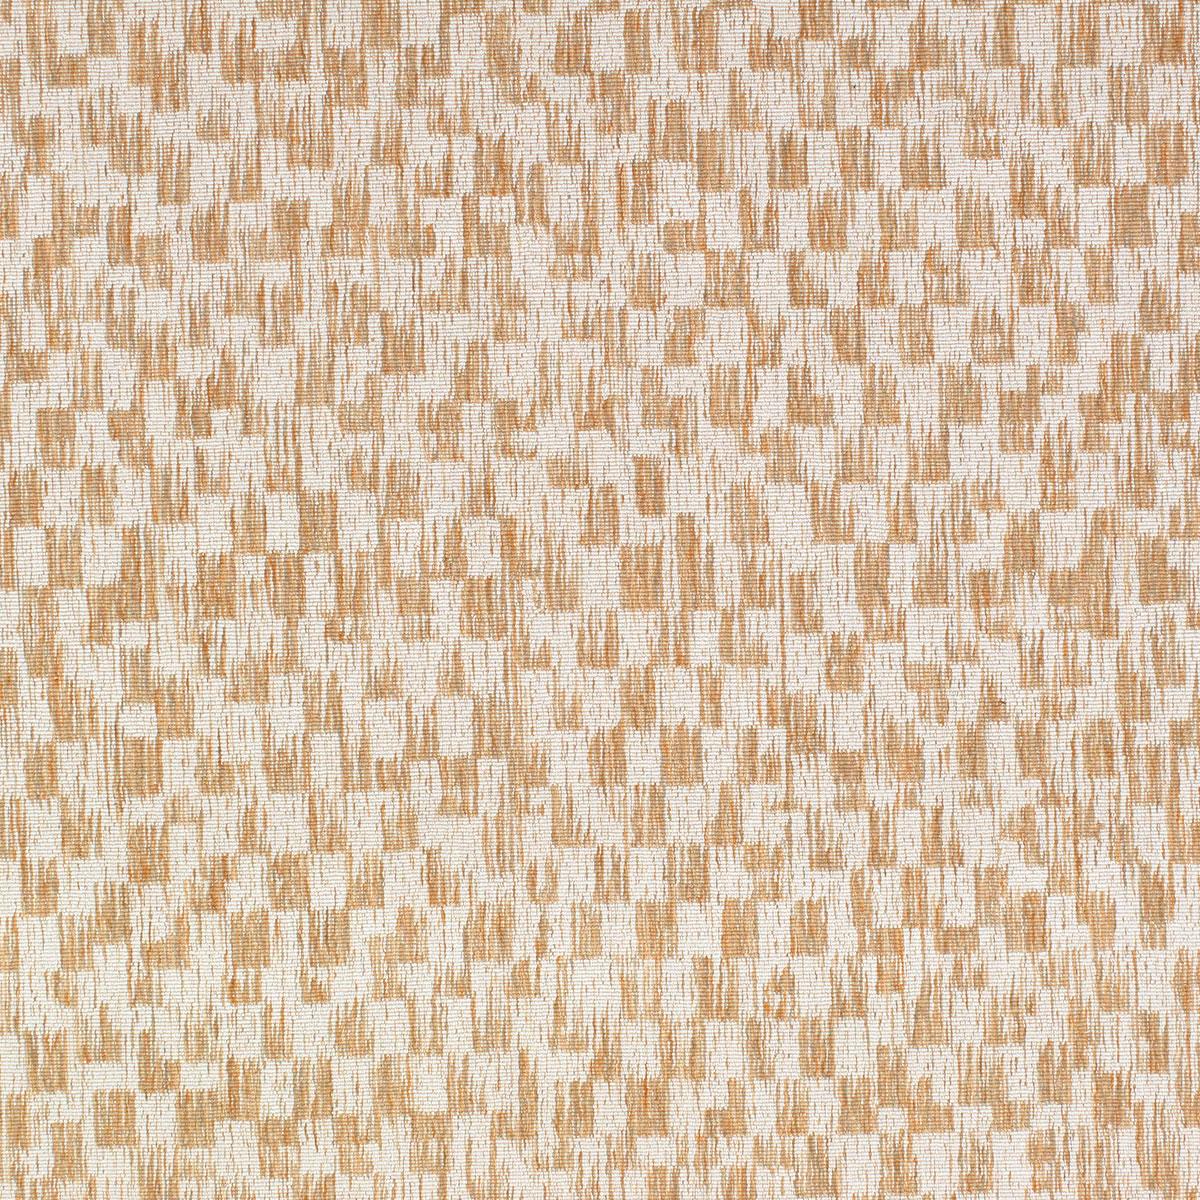 conner_wool-nylon_broadloom_patterson-flynn-martin_pfm